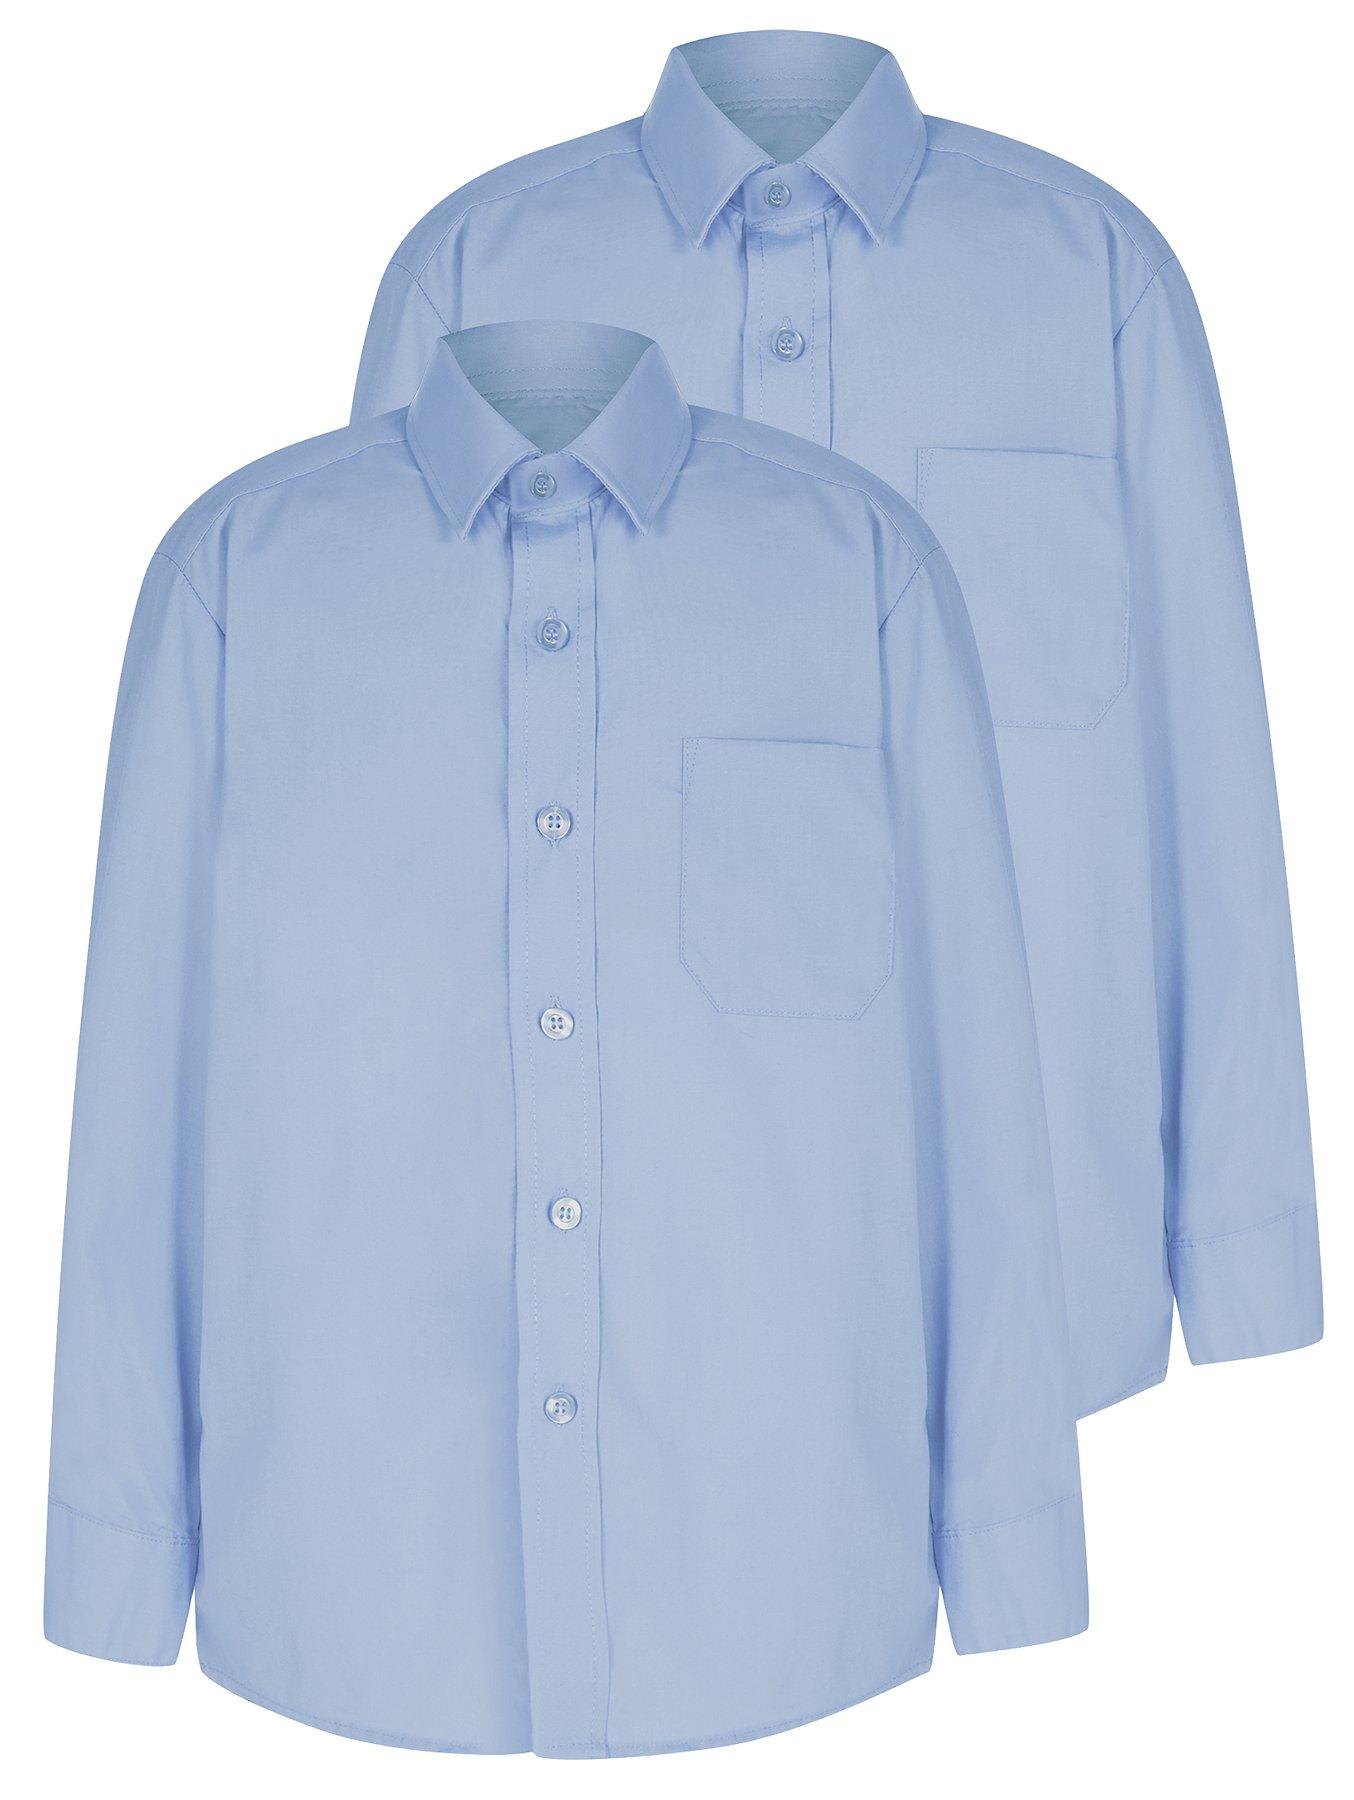 Girls School 2 Pack Easy Iron Long Sleeve Shirt Light Blue